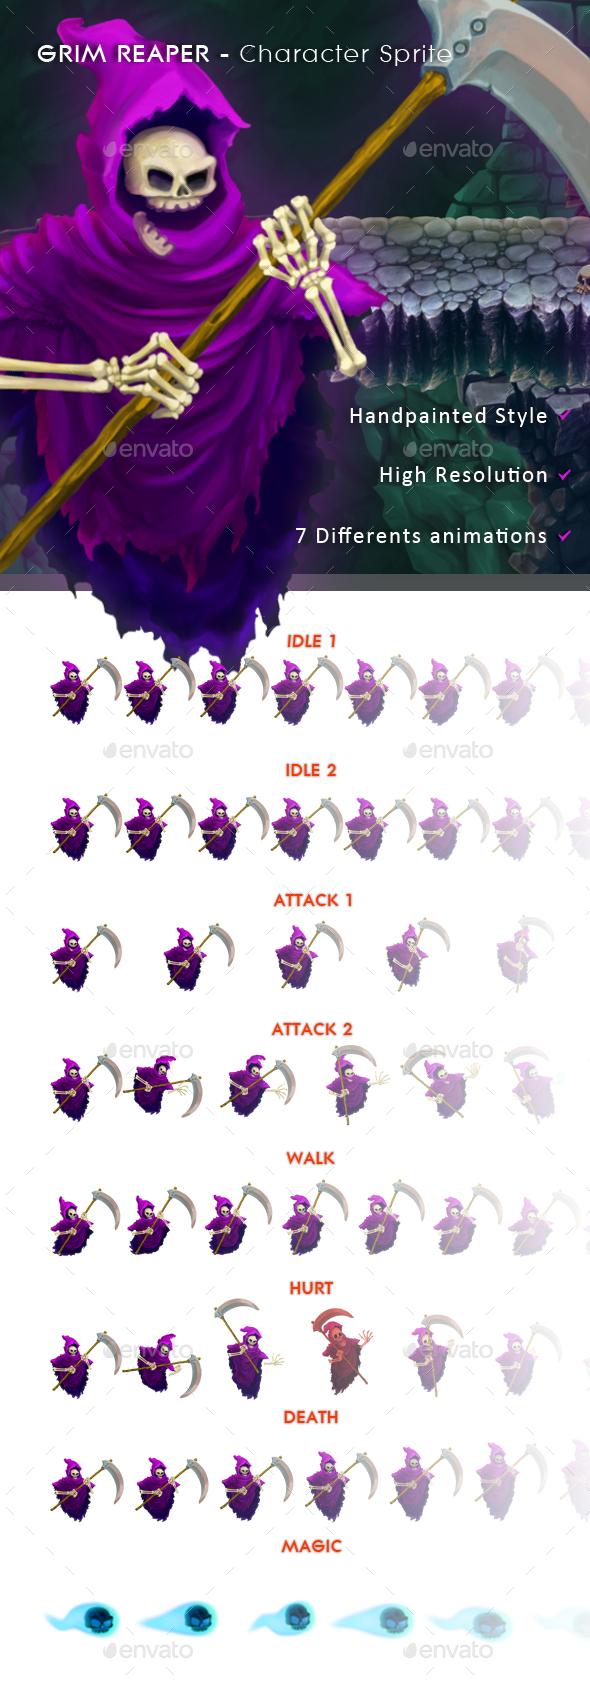 Grim Reaper - Character Sprite (Sprites)